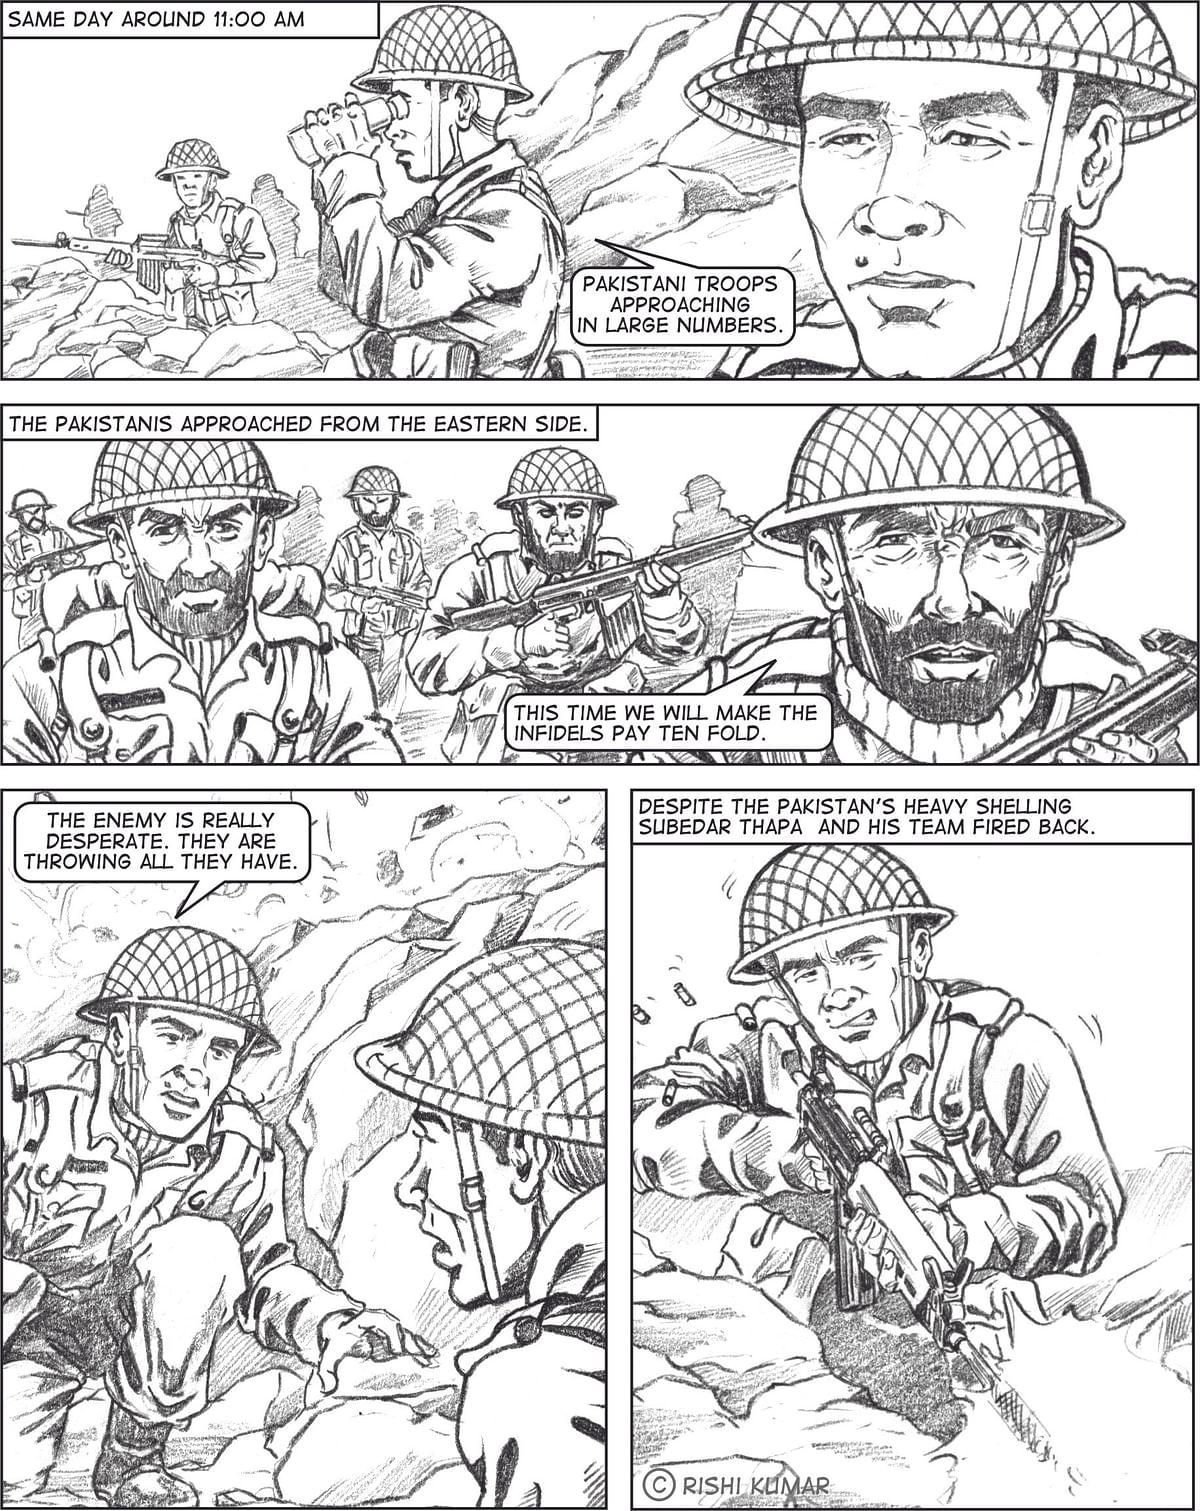 An excerpt from the comic on Subedar Tika Bahadur Thapa.